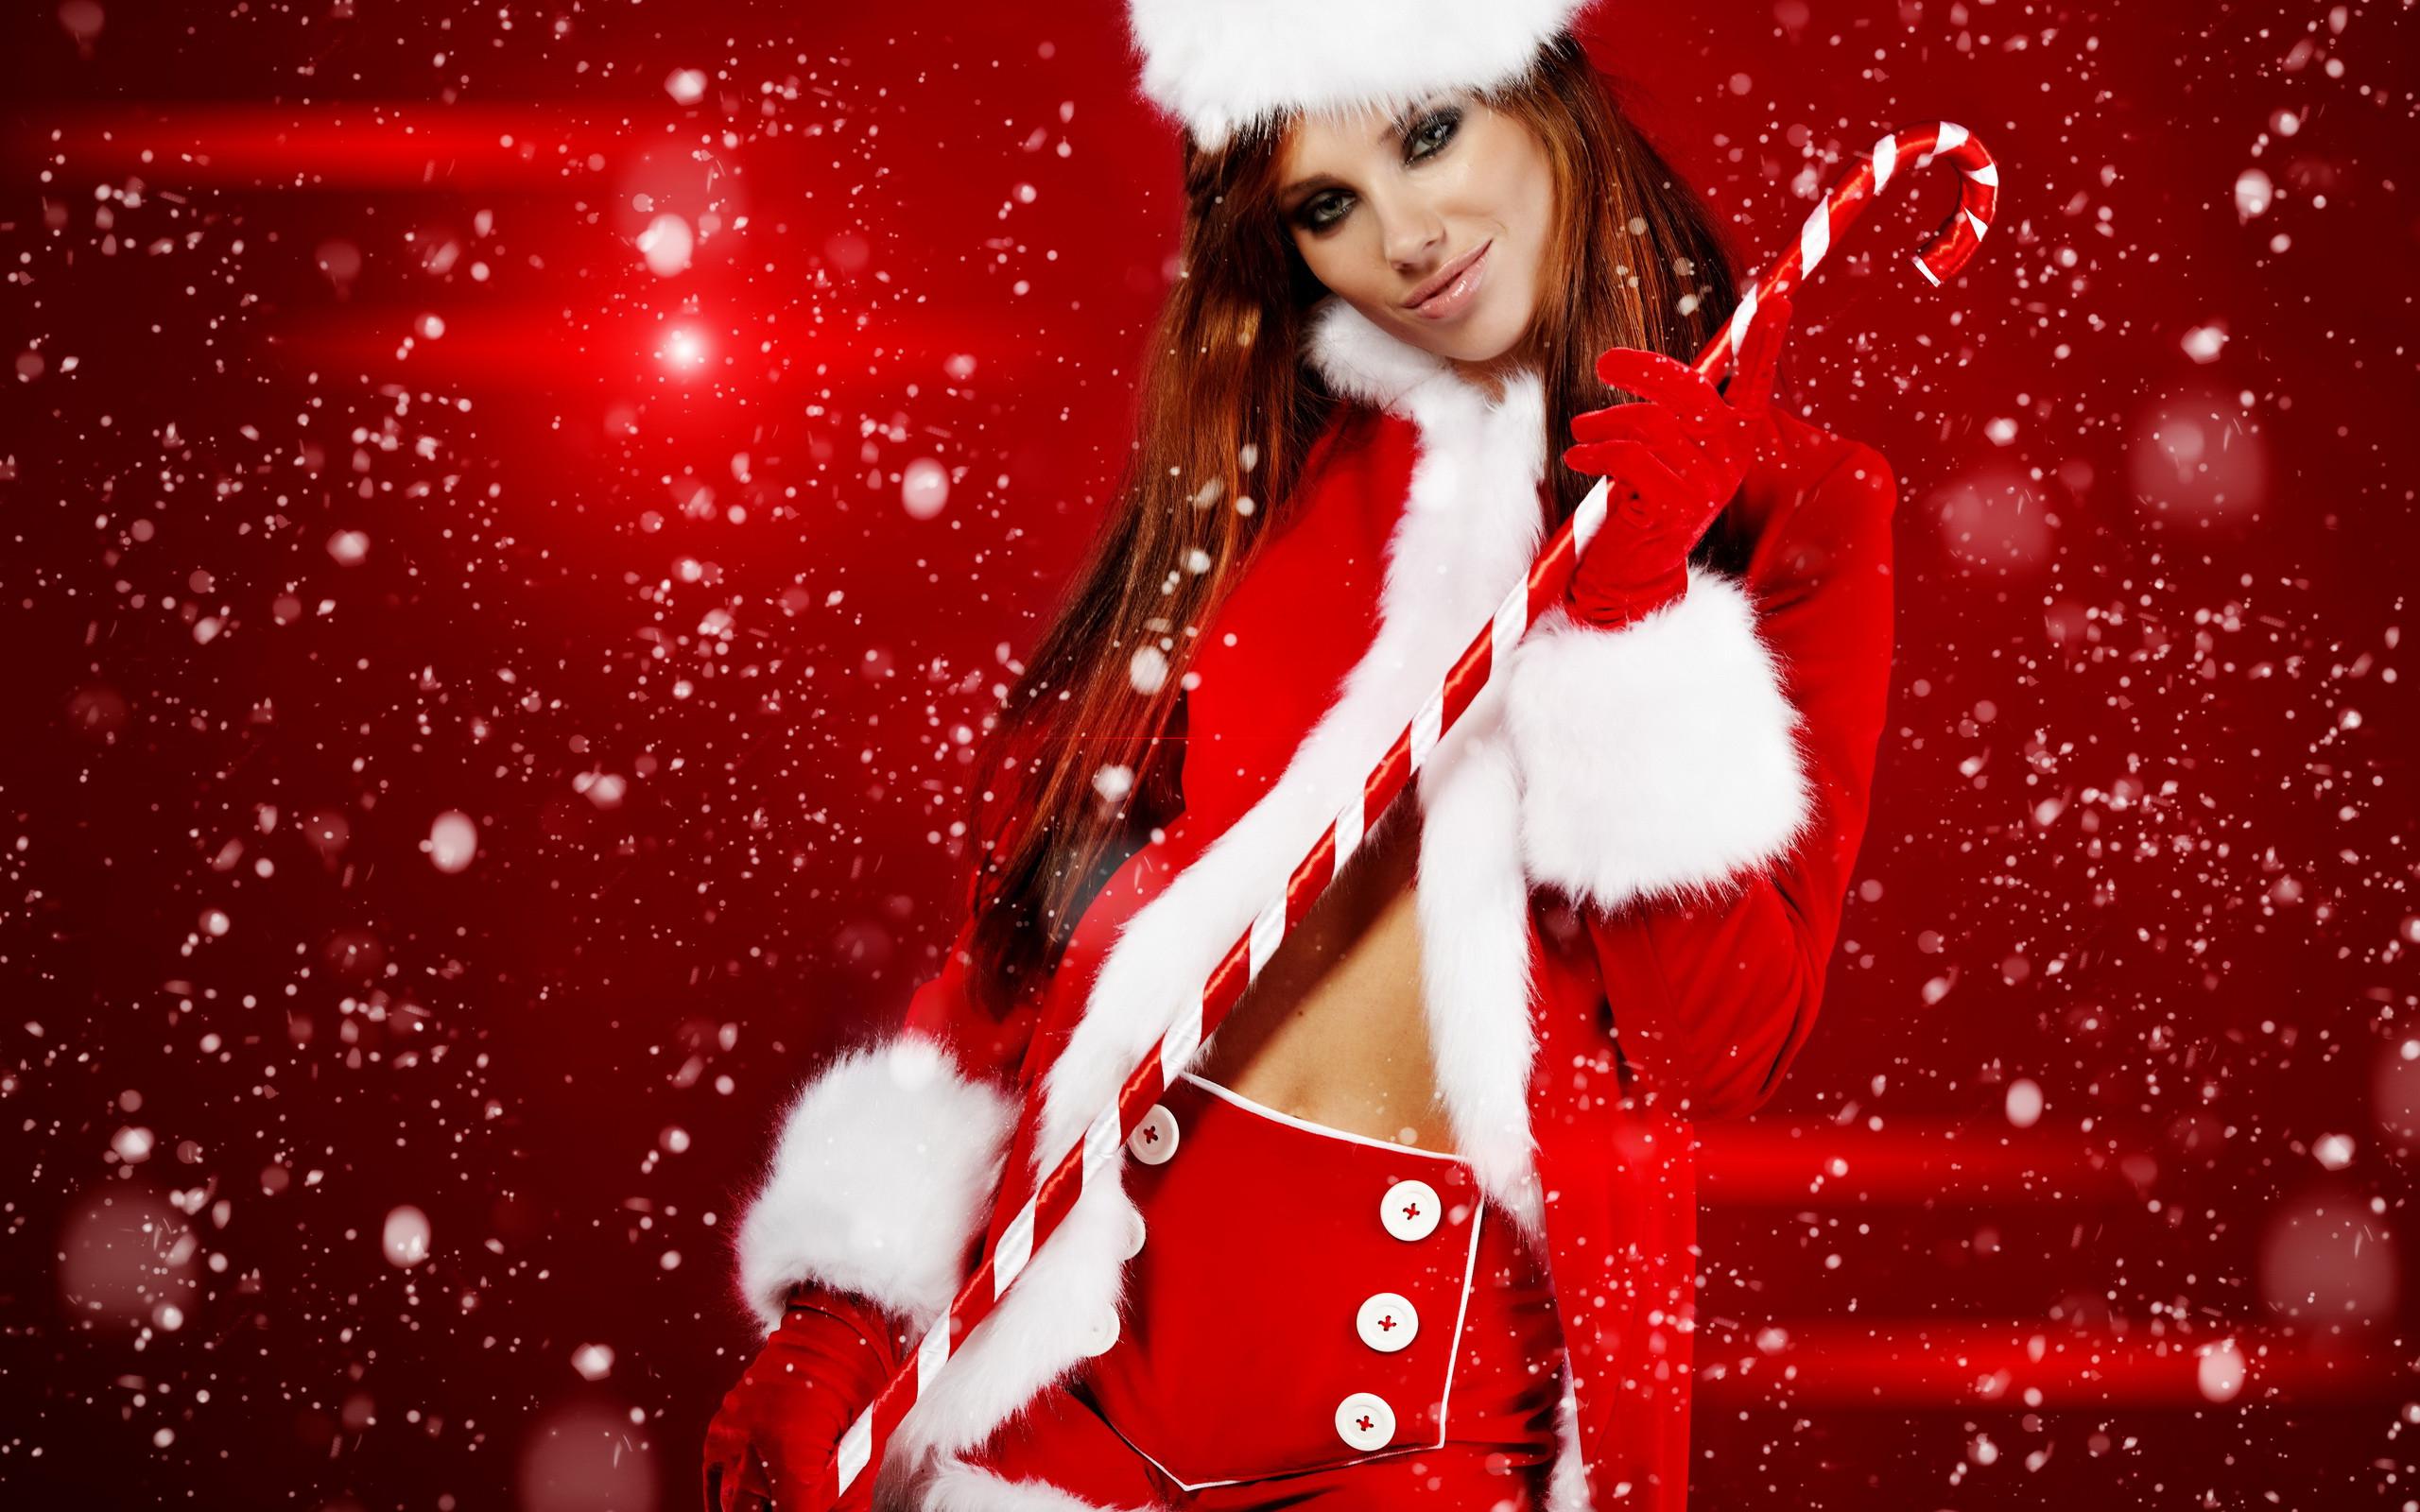 Christmas Girl Wallpaper Free Download